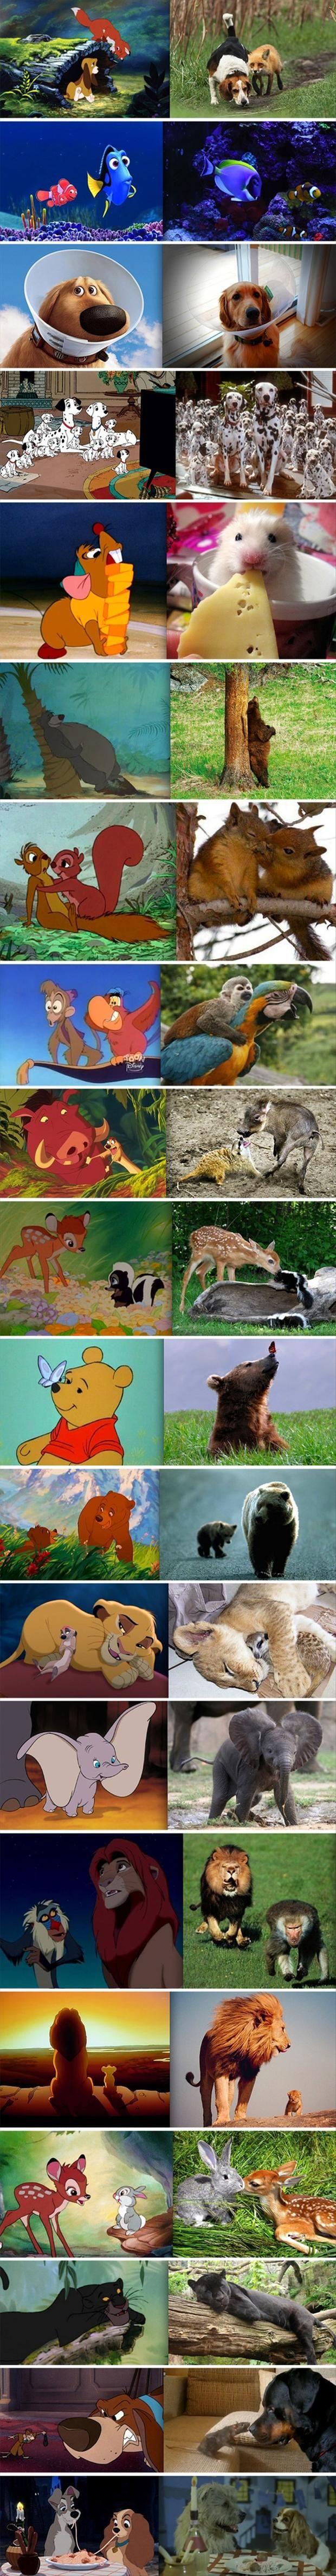 z cartoons look like real life animals